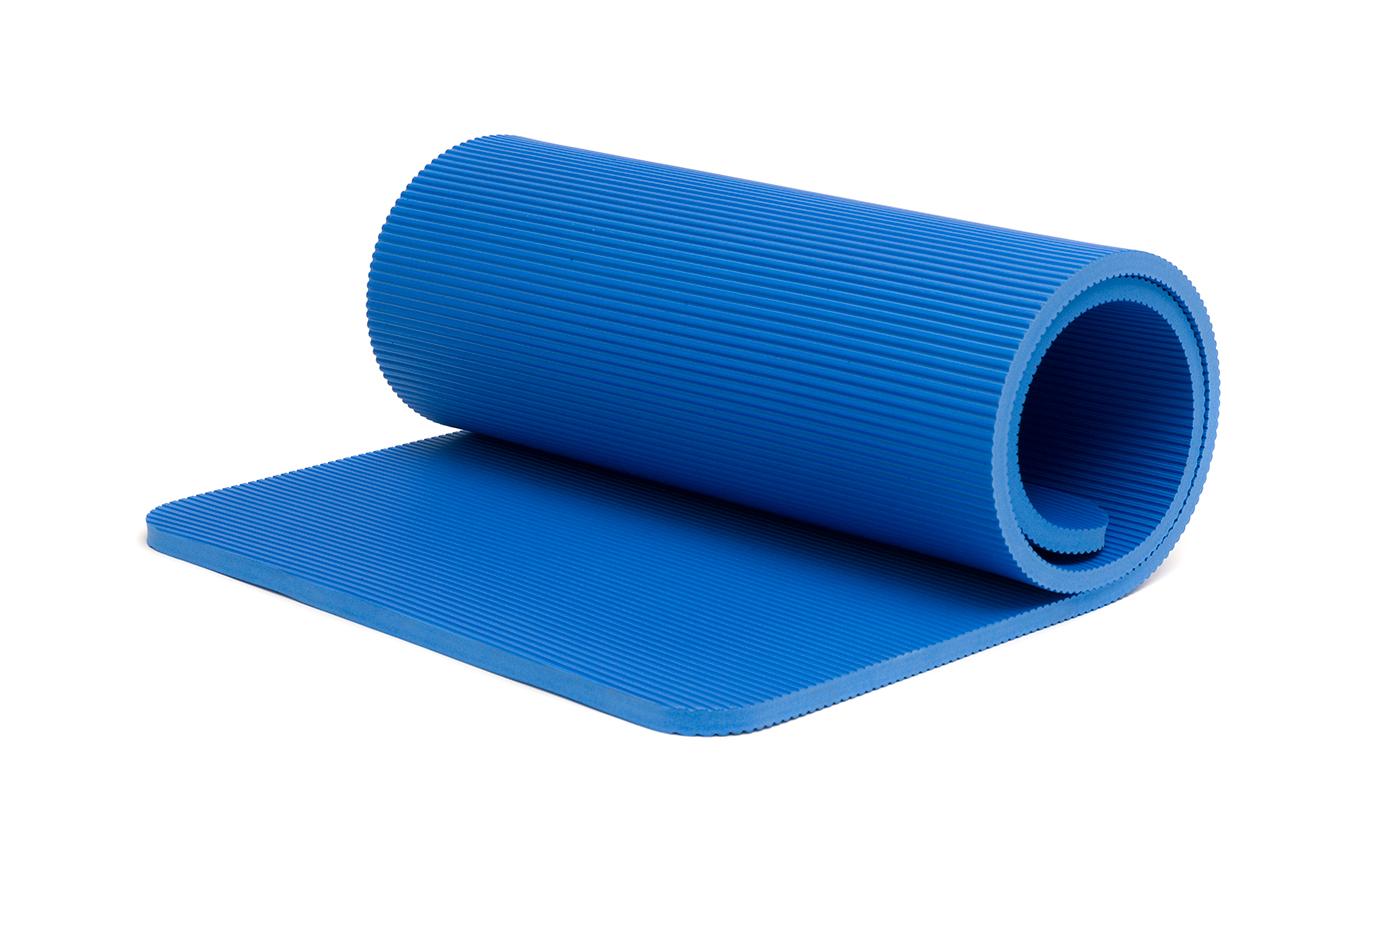 Pilates mat 'Pro' blue buy online at YOGISTAR.COM | Yoga ...